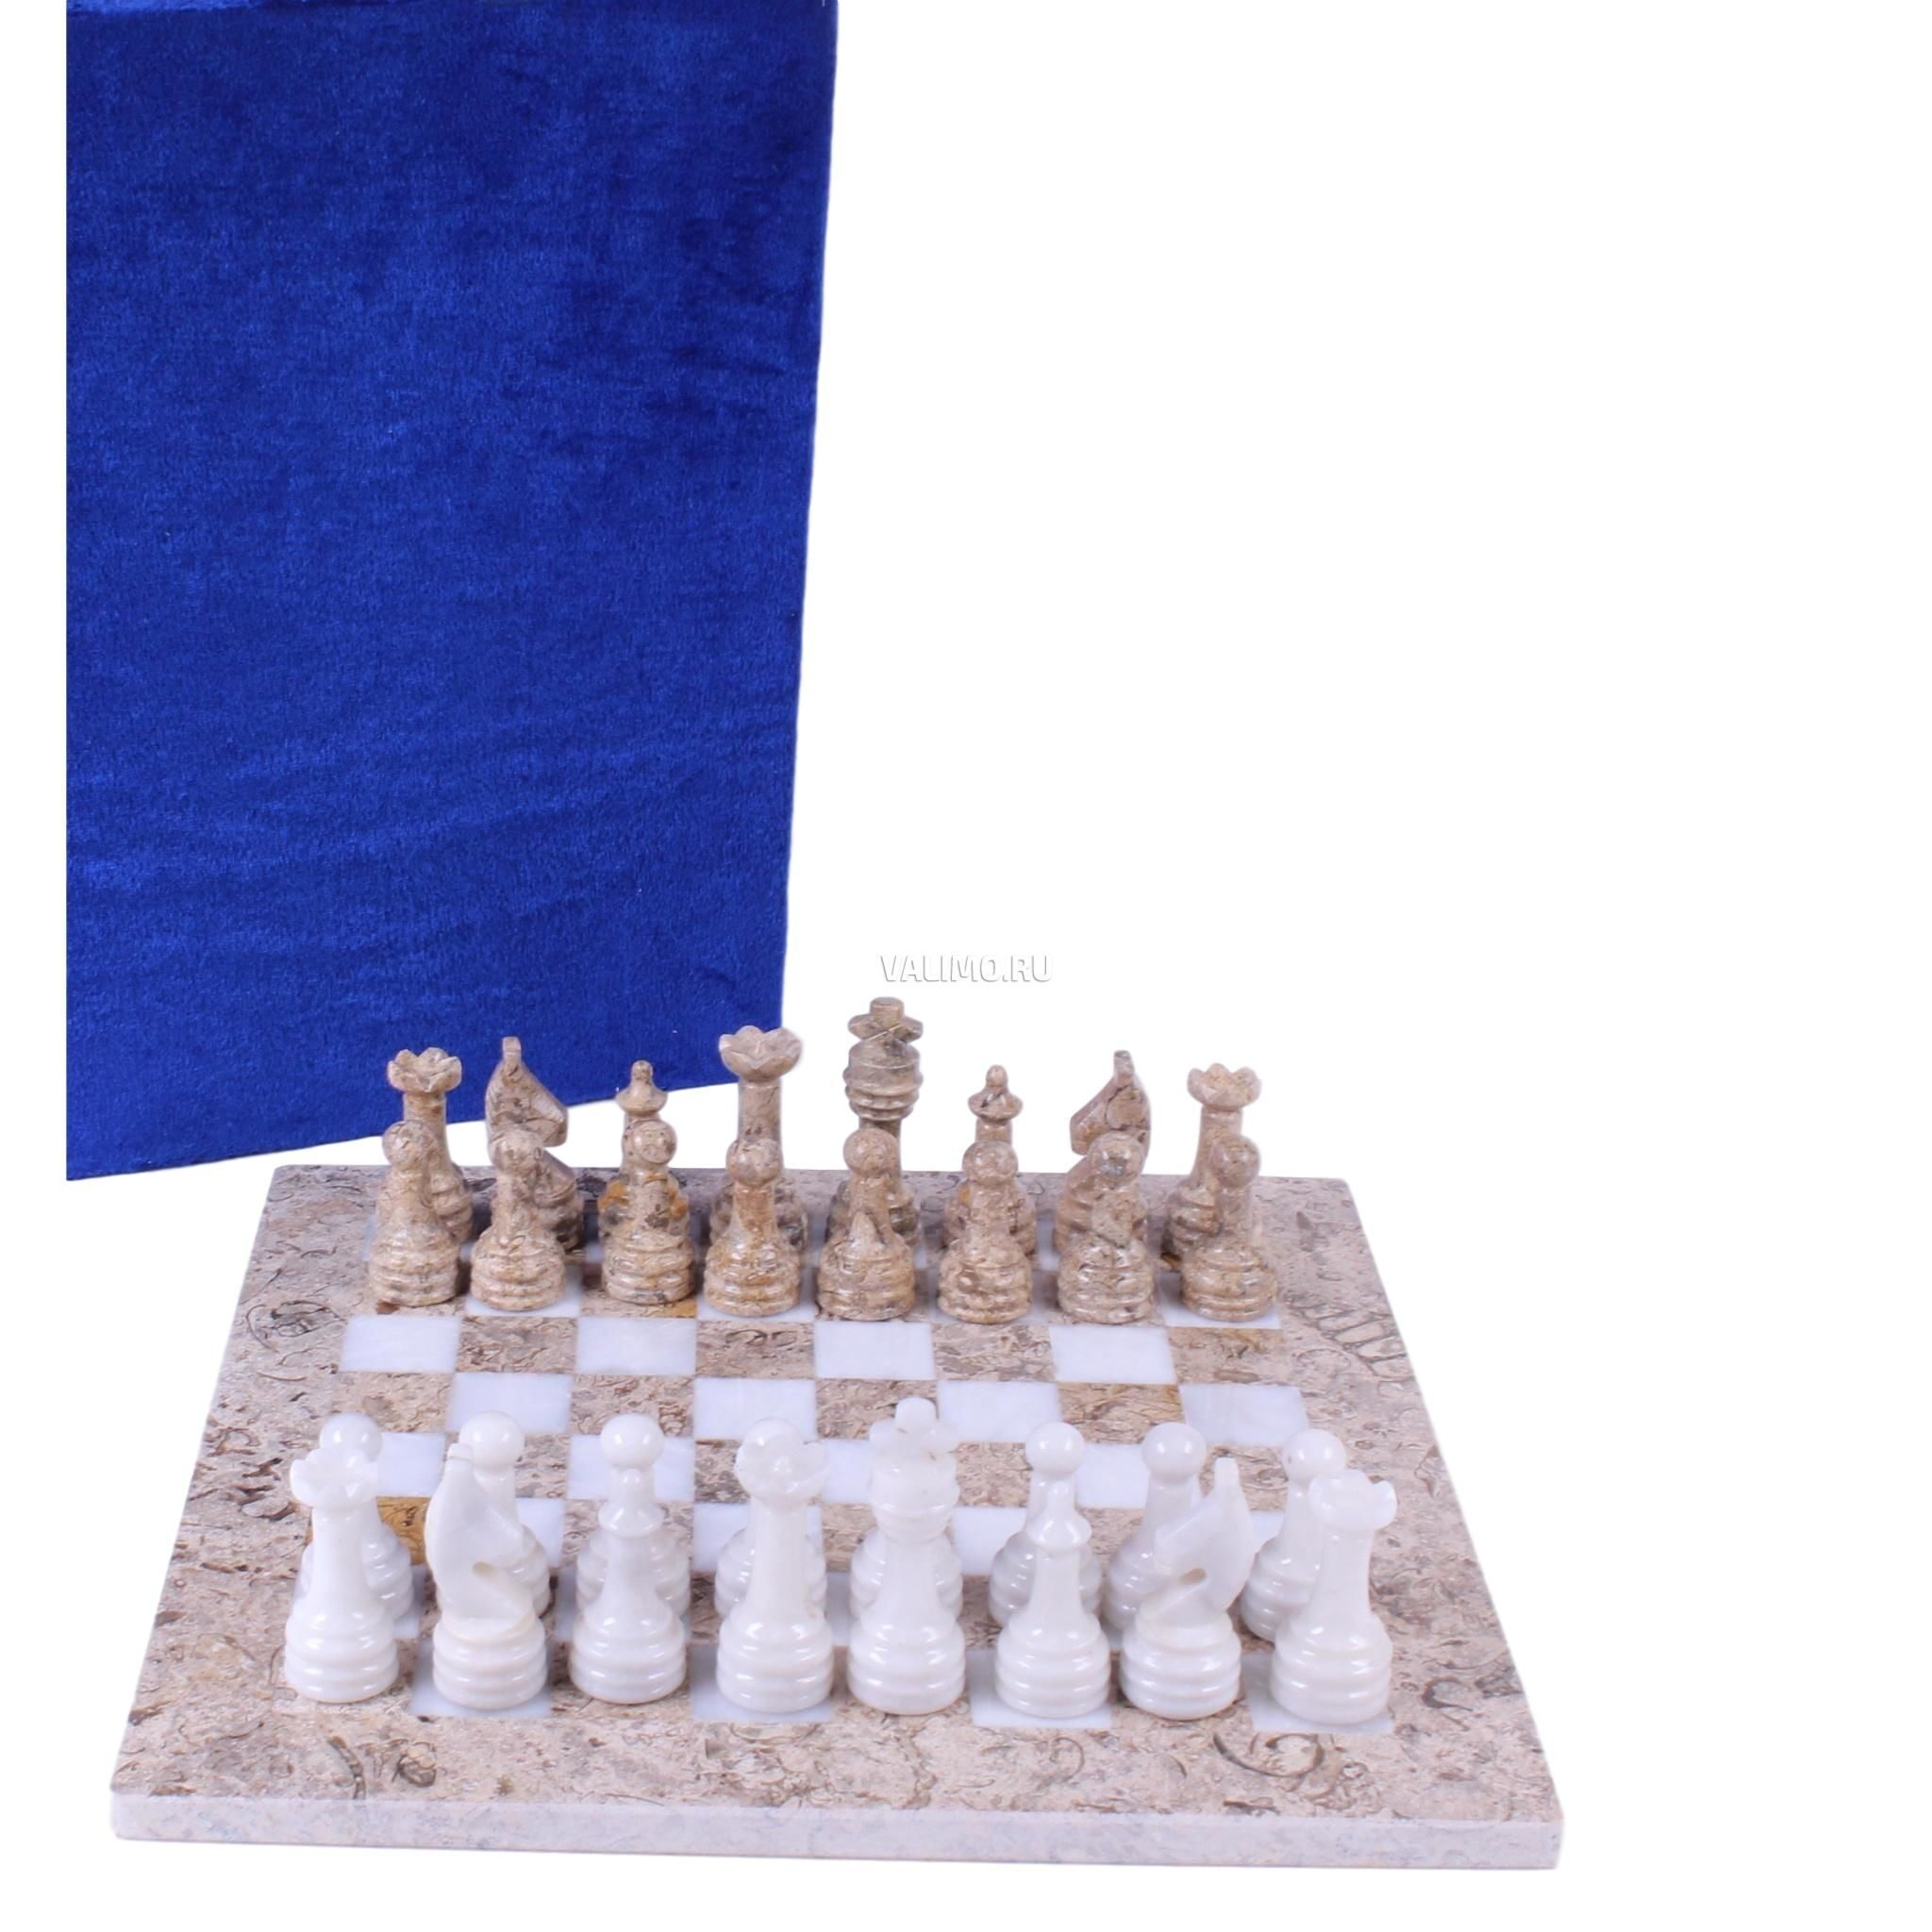 Шахматная страна картинки 4